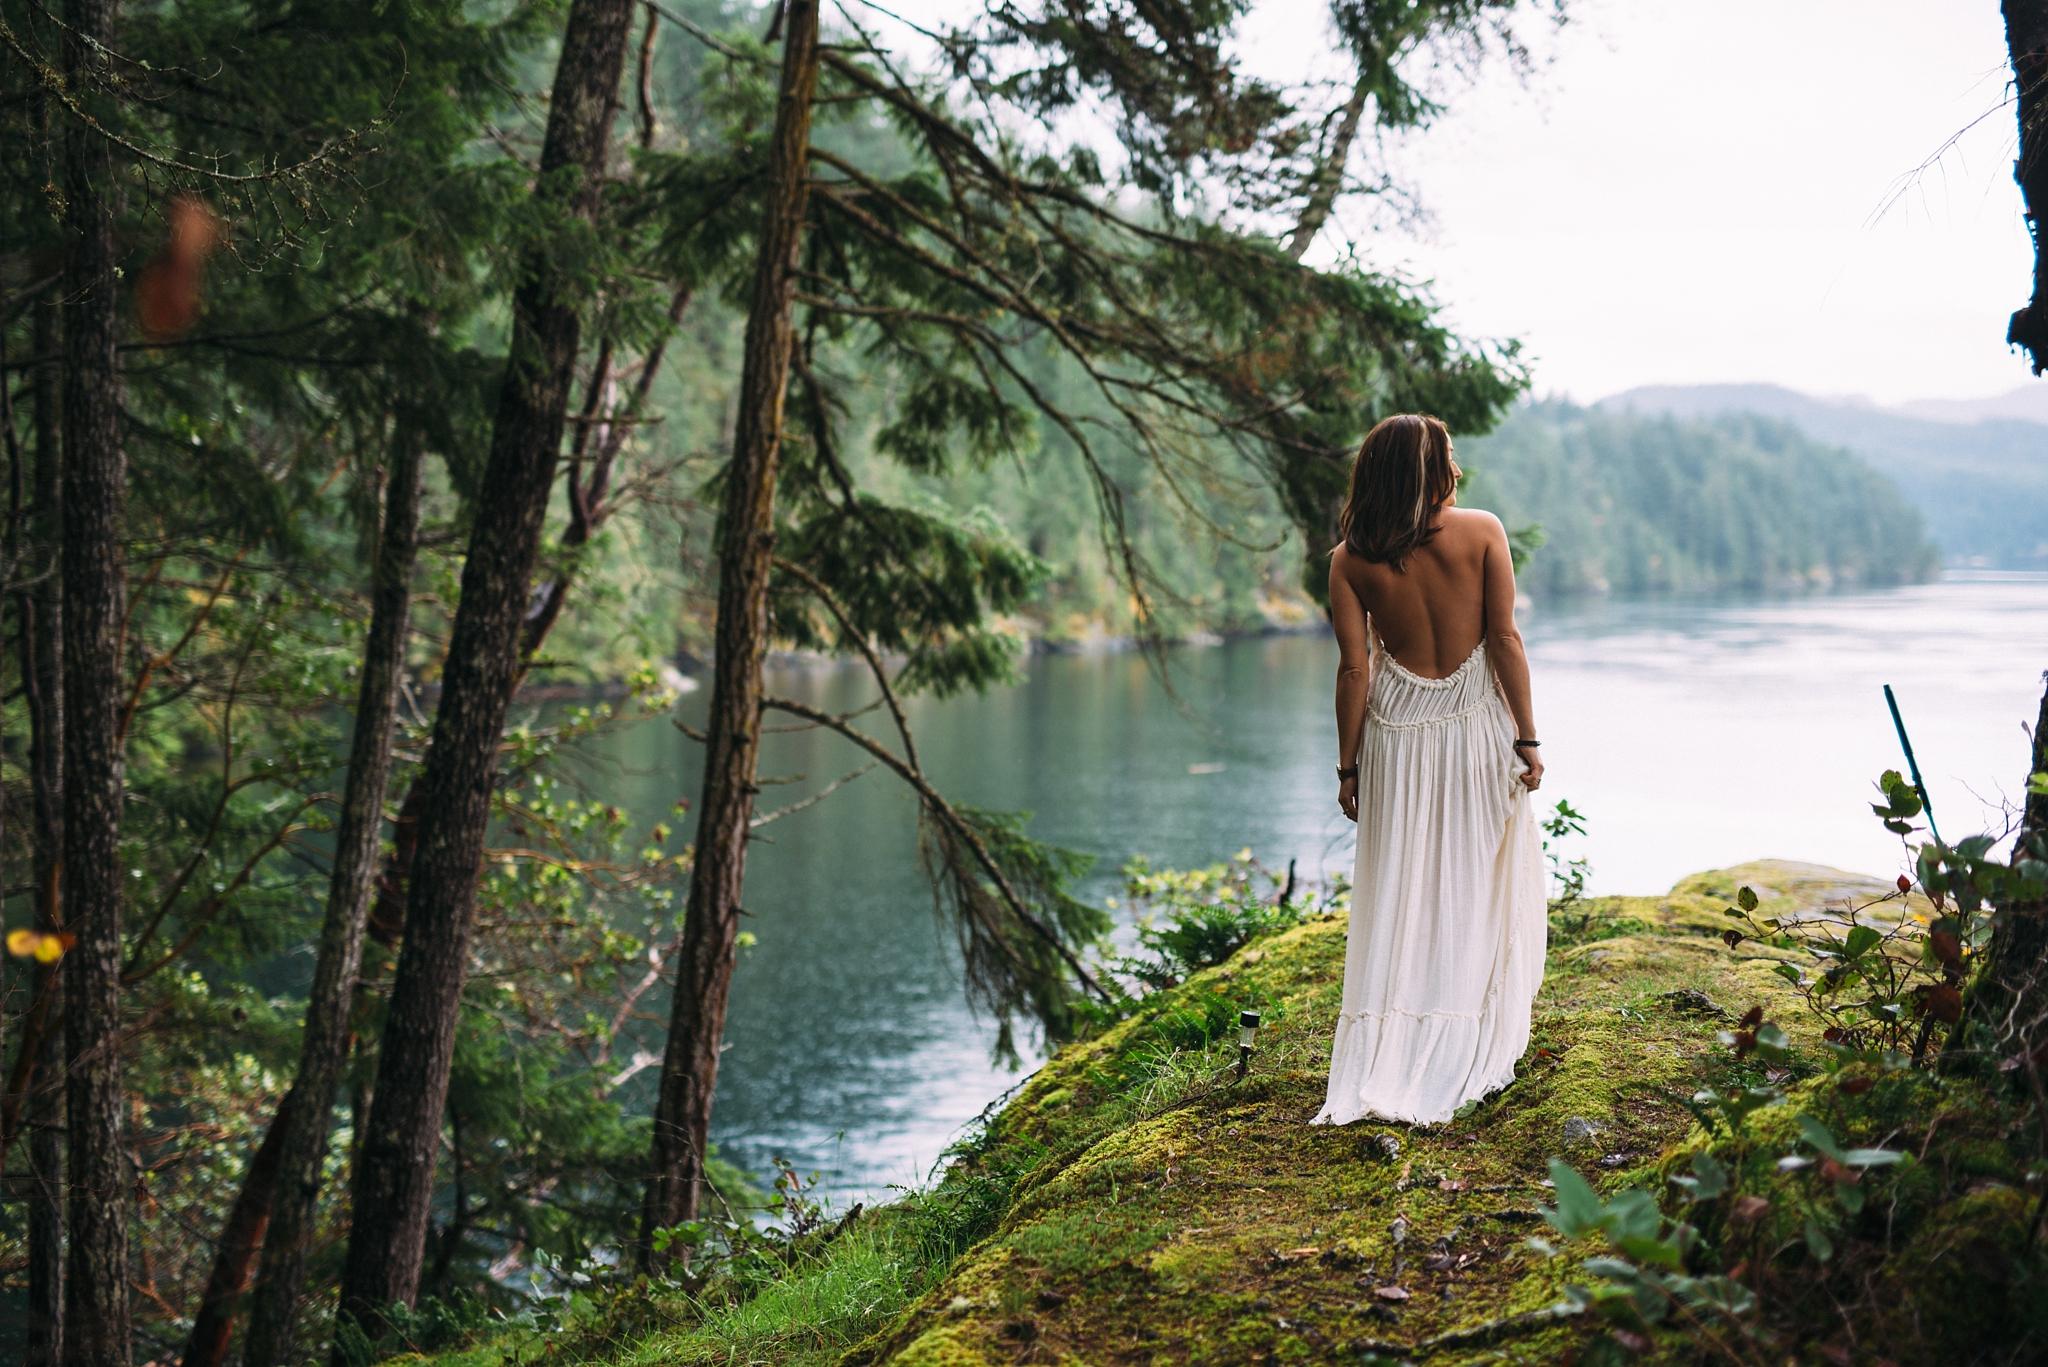 kaihla_tonai_intimate_wedding_elopement_photographer_3378